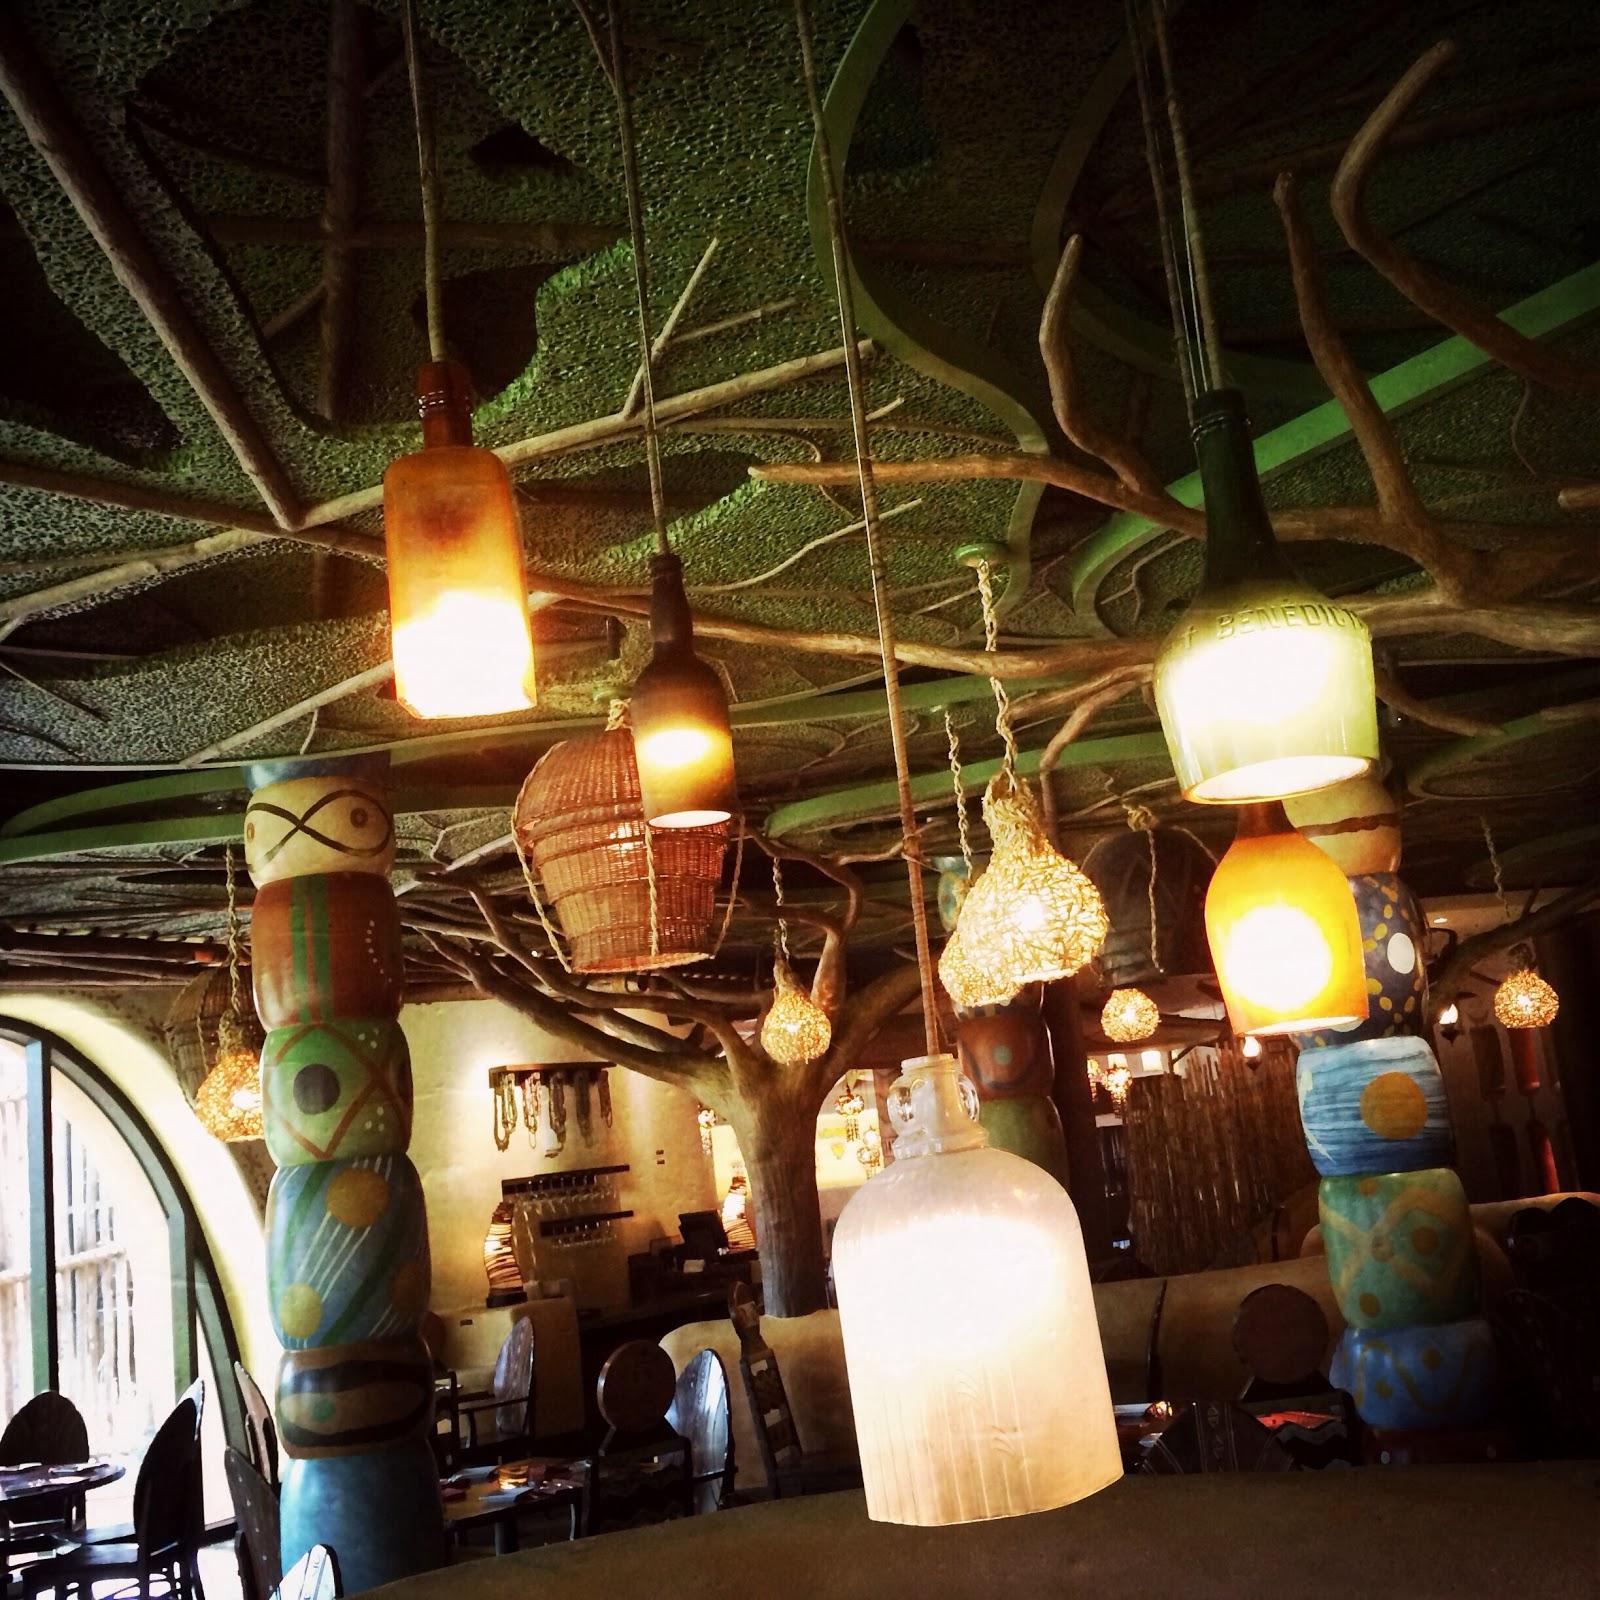 repurposed lighting. Repurposed Bottle Lights At Sanaa With Lighting Fixtures R